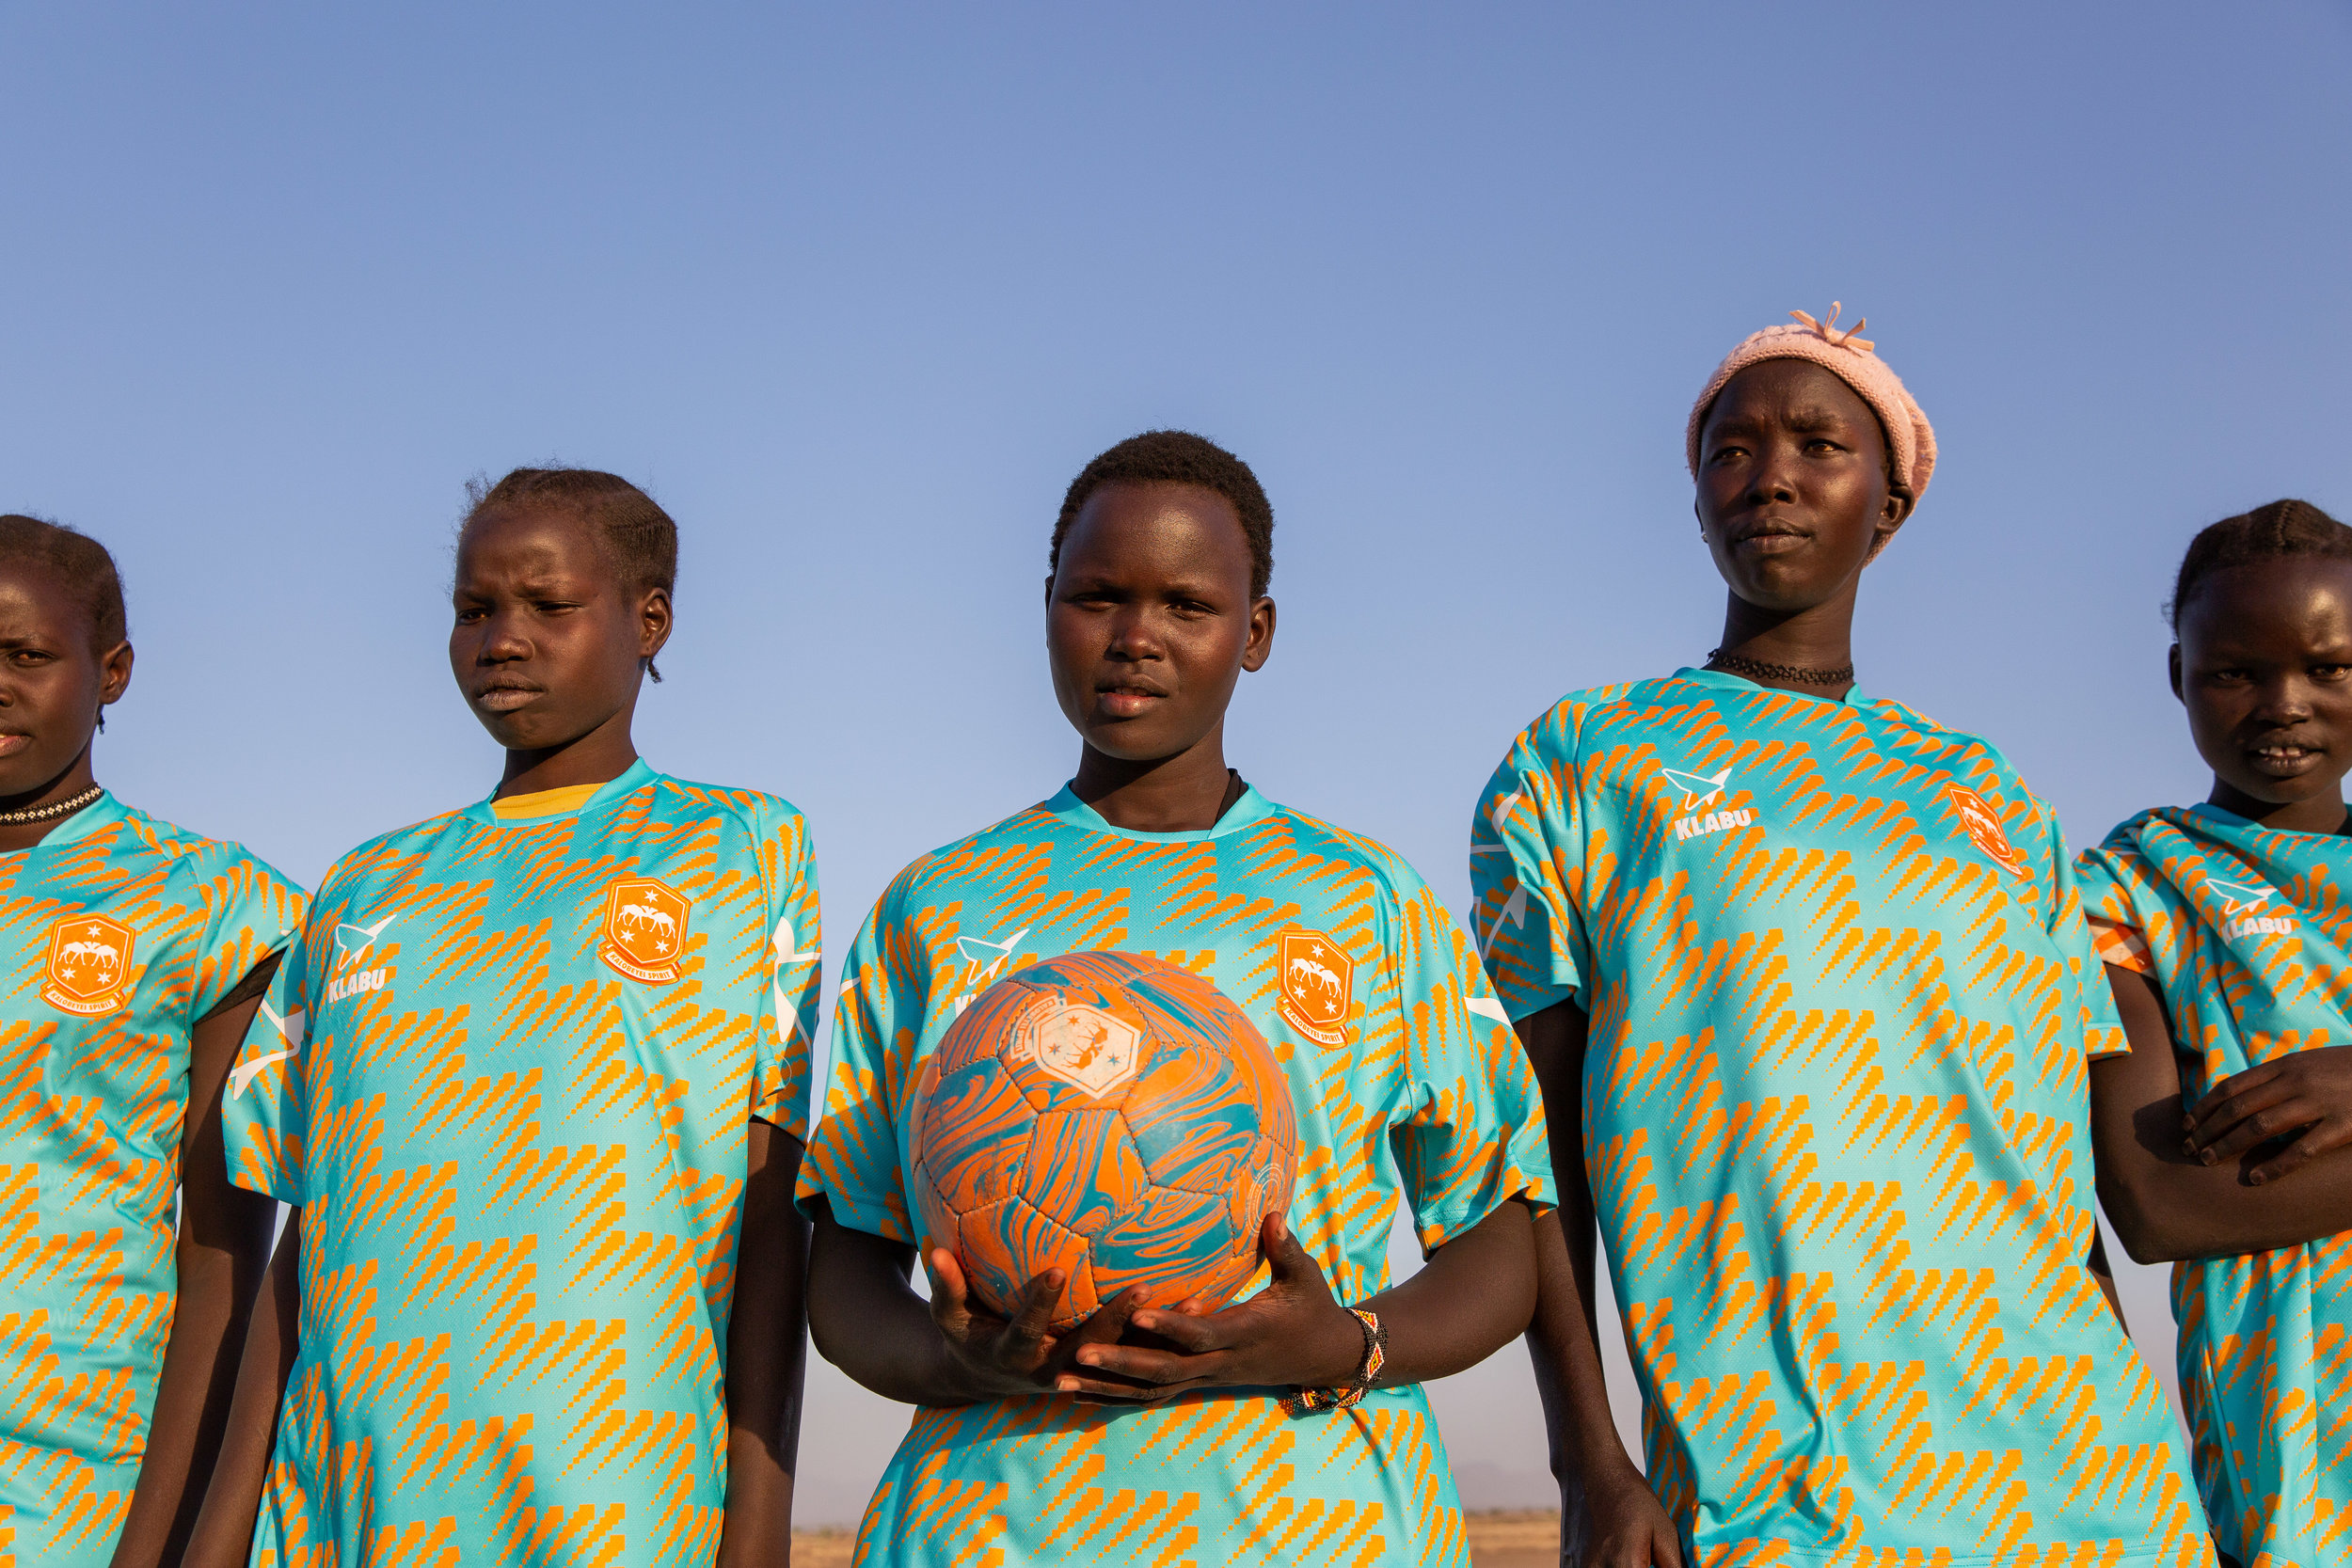 07_KLABU Campaign image _ by Coco Olakunle.jpg